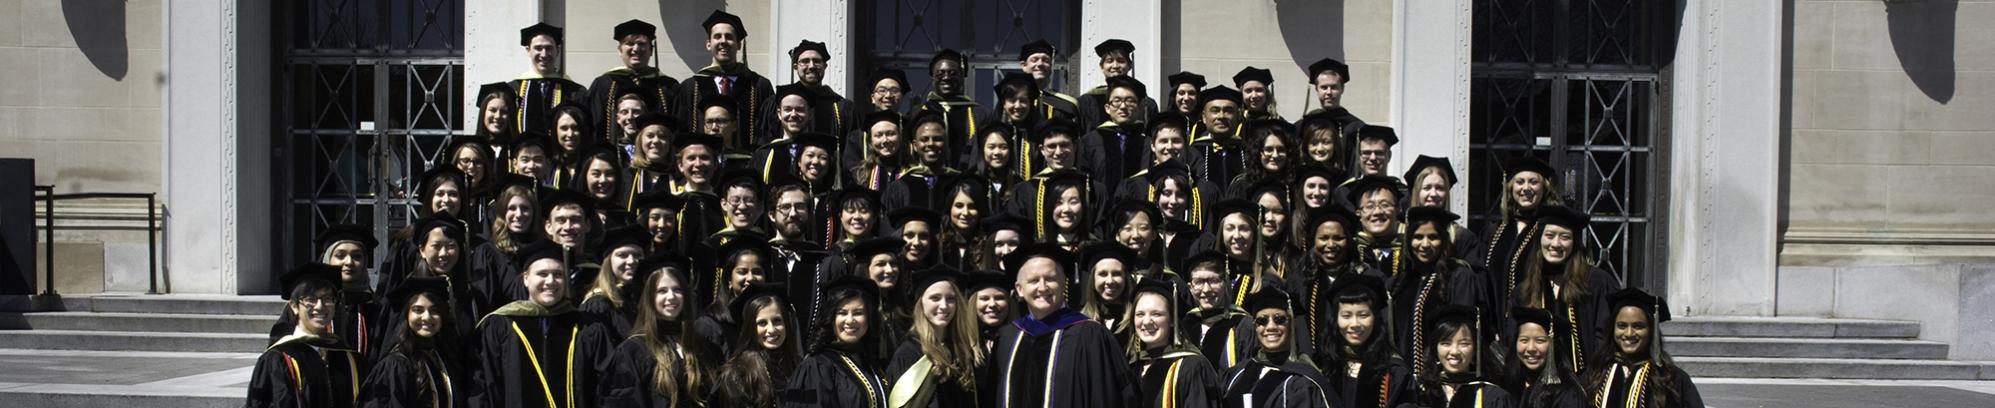 2016 Graduation Class